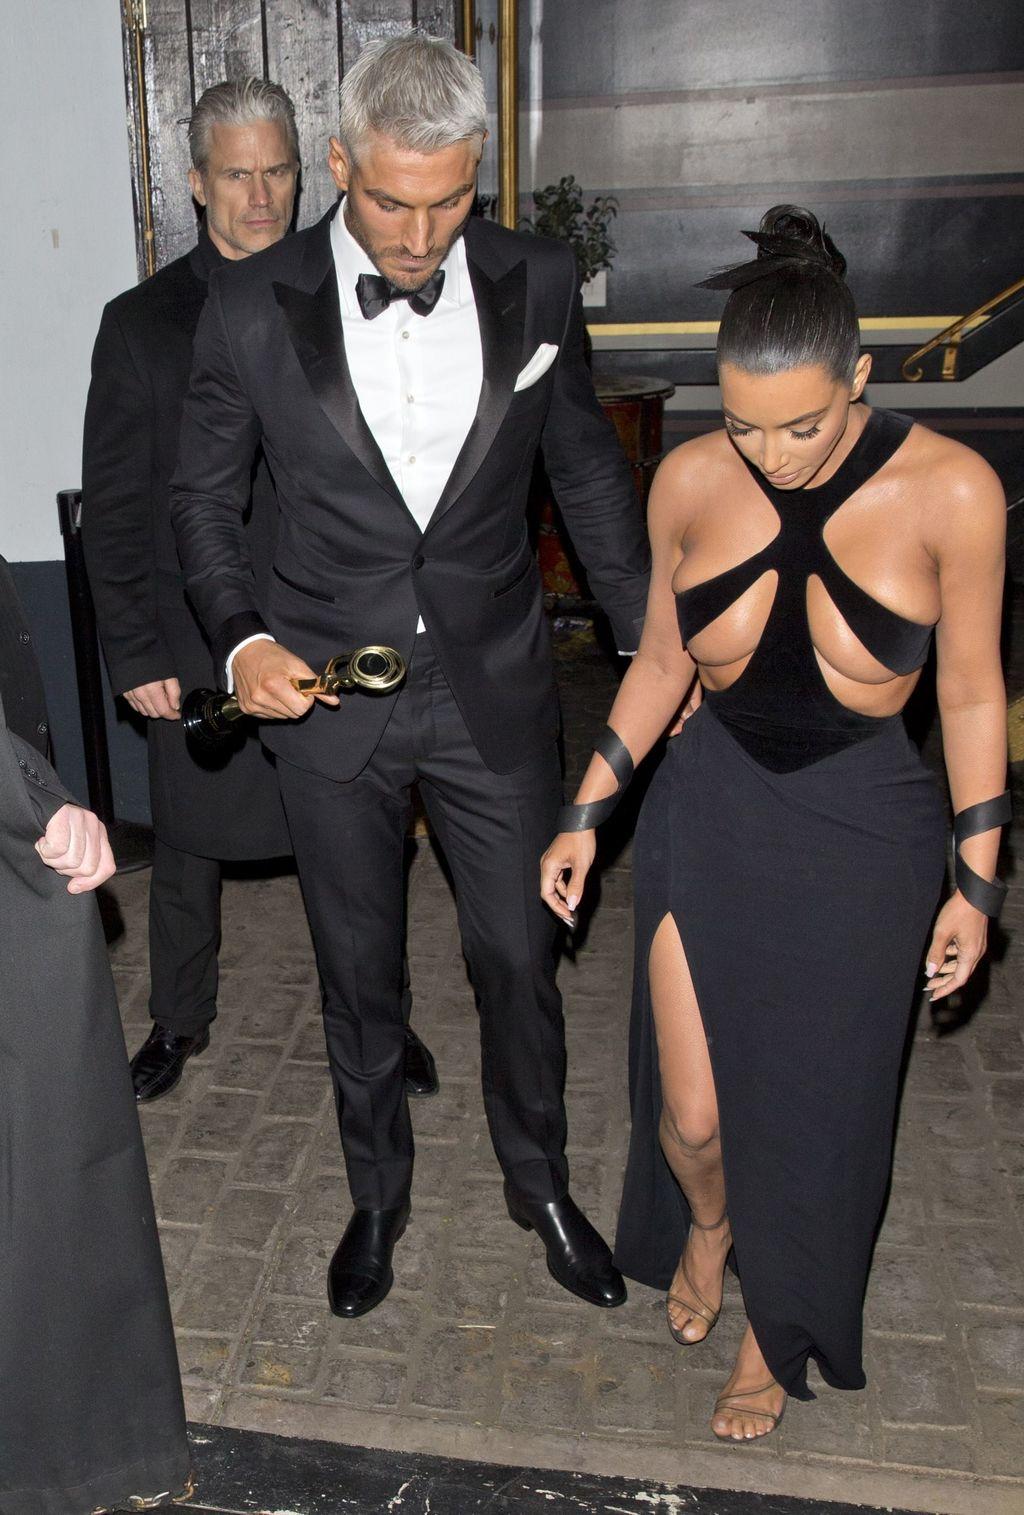 kim-Kim Kardashian s'affiche dans une robe ultra-sexy !-rend-aux-hollywood-beauty-awards-dans-une-robe-denudee-tres-sexy-fevrier-2018-avec-son-coiffeur-chris-appleton_width1024 (2)